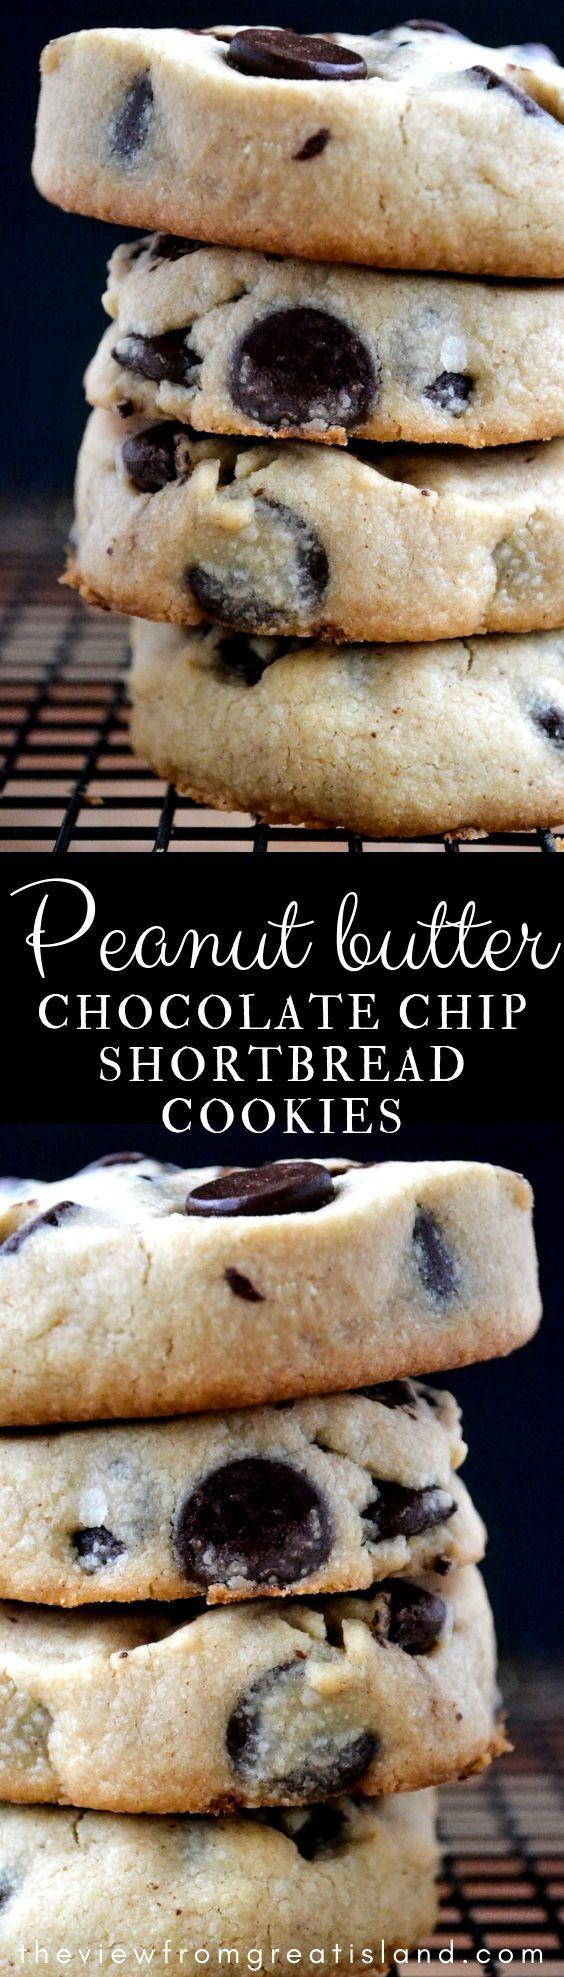 Erdnussbutter Chocolate Chip Shortbread Cookies si…